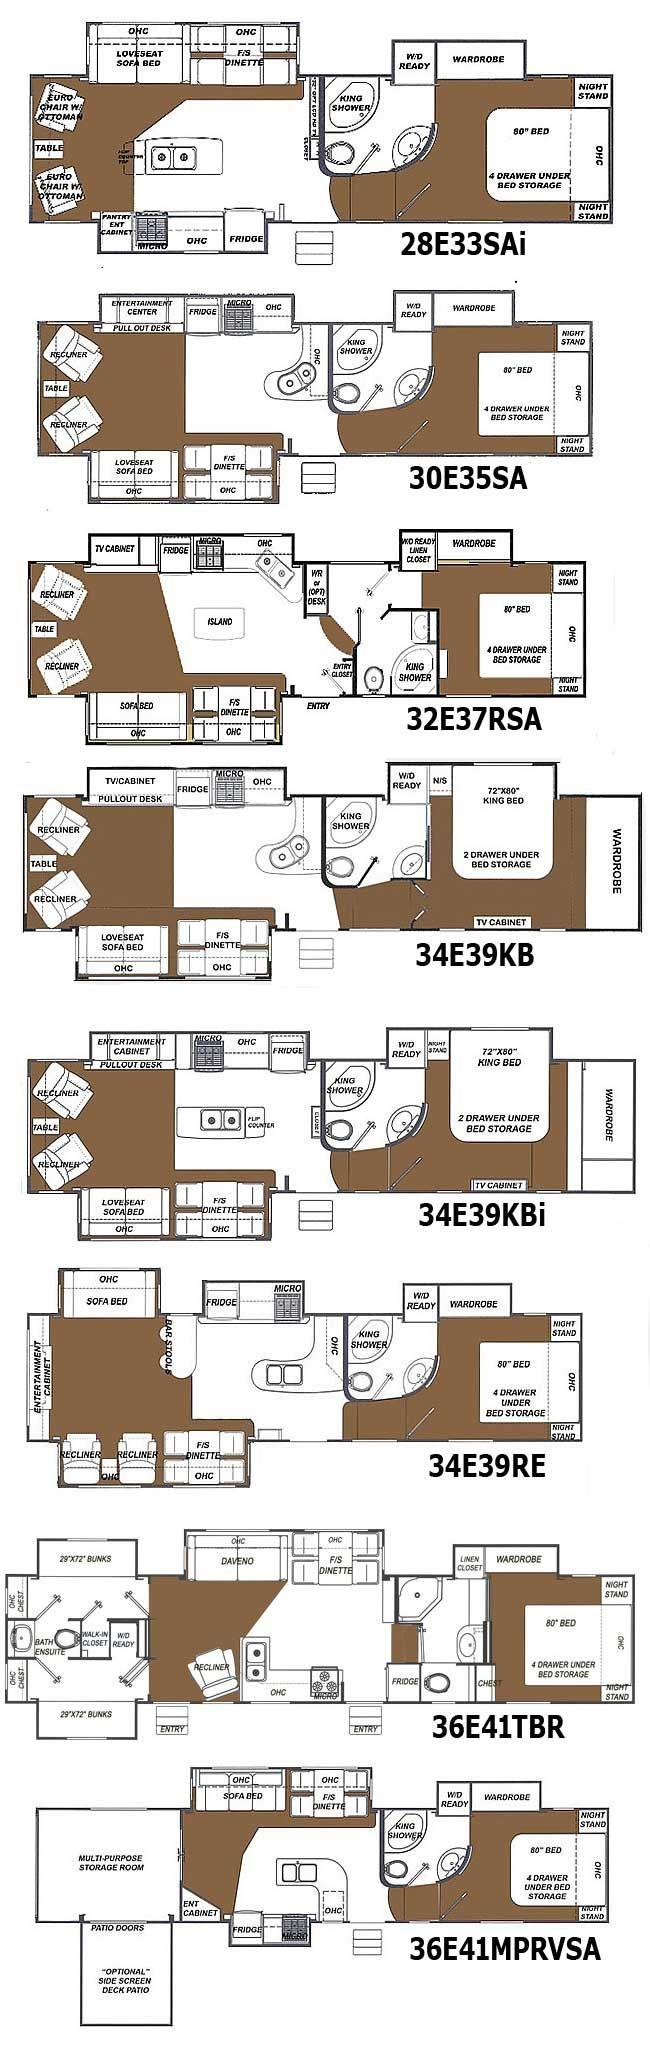 Glendale Titanium fifth wheel floorplans - 8 layouts | RV Baby ...